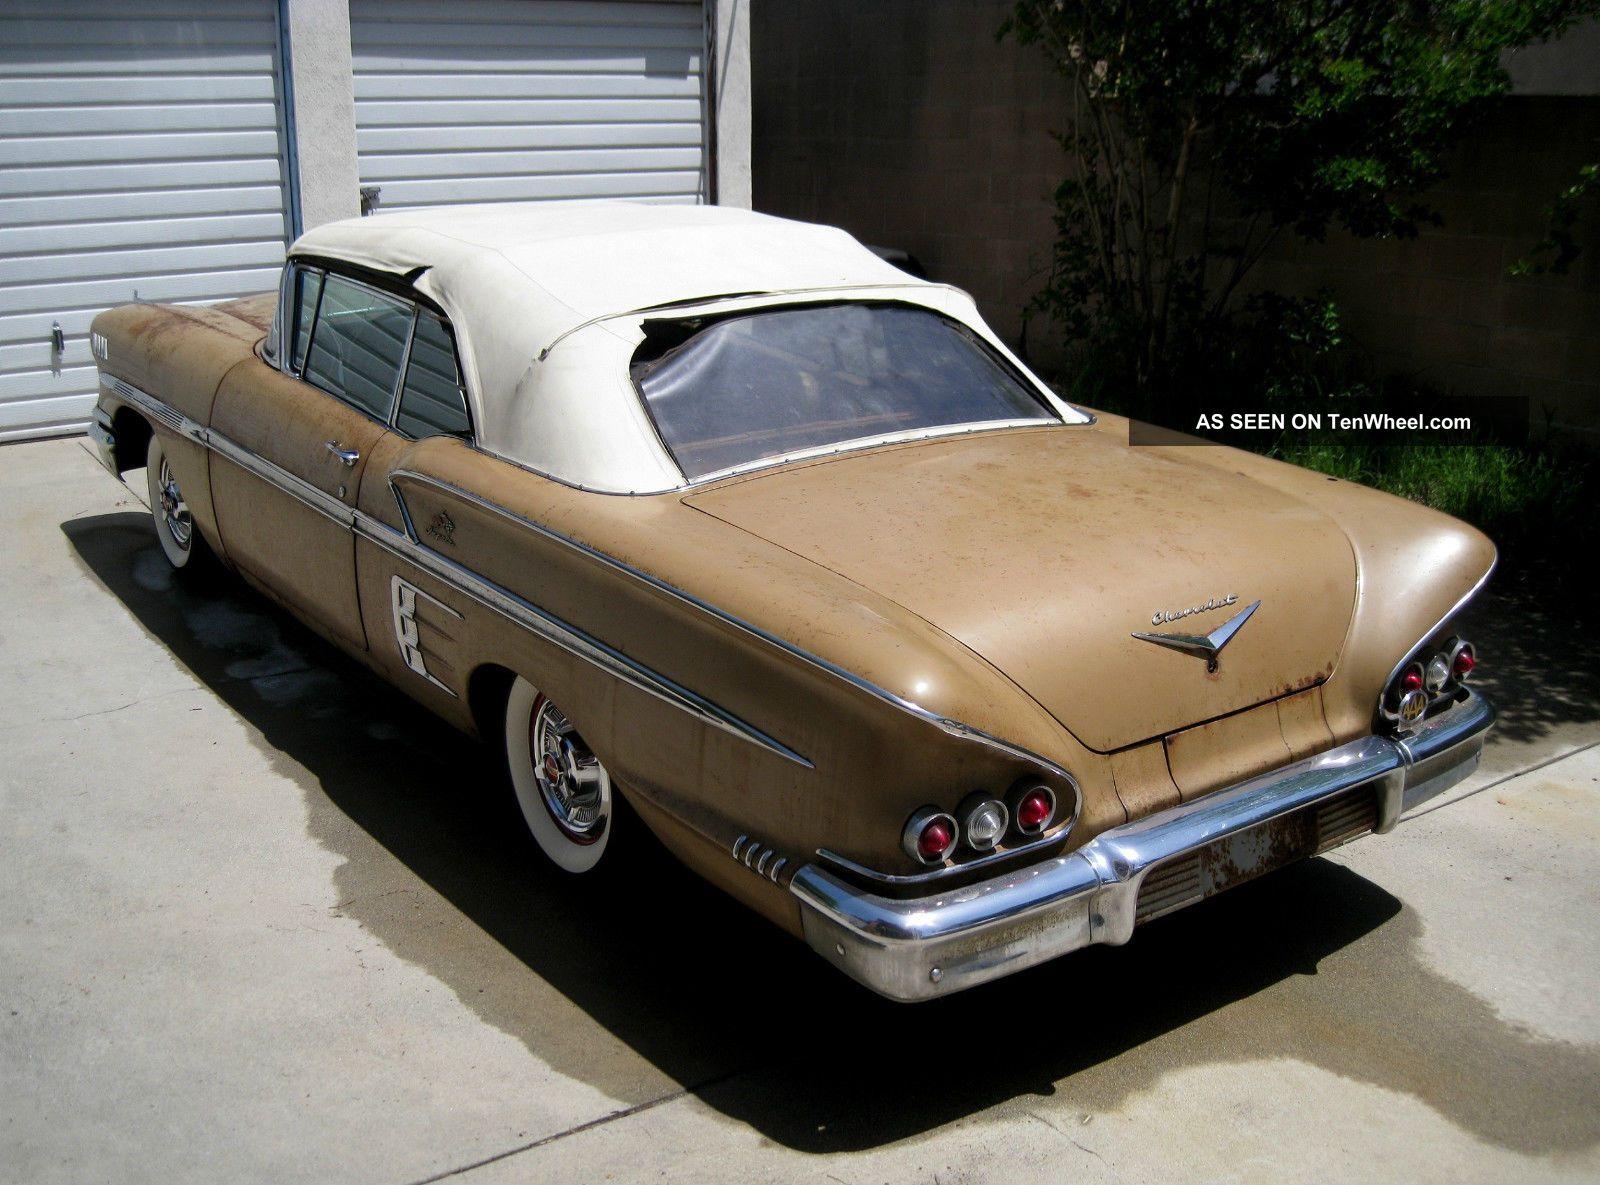 1958 Chevrolet Impala Convertible Barn Find Impala photo